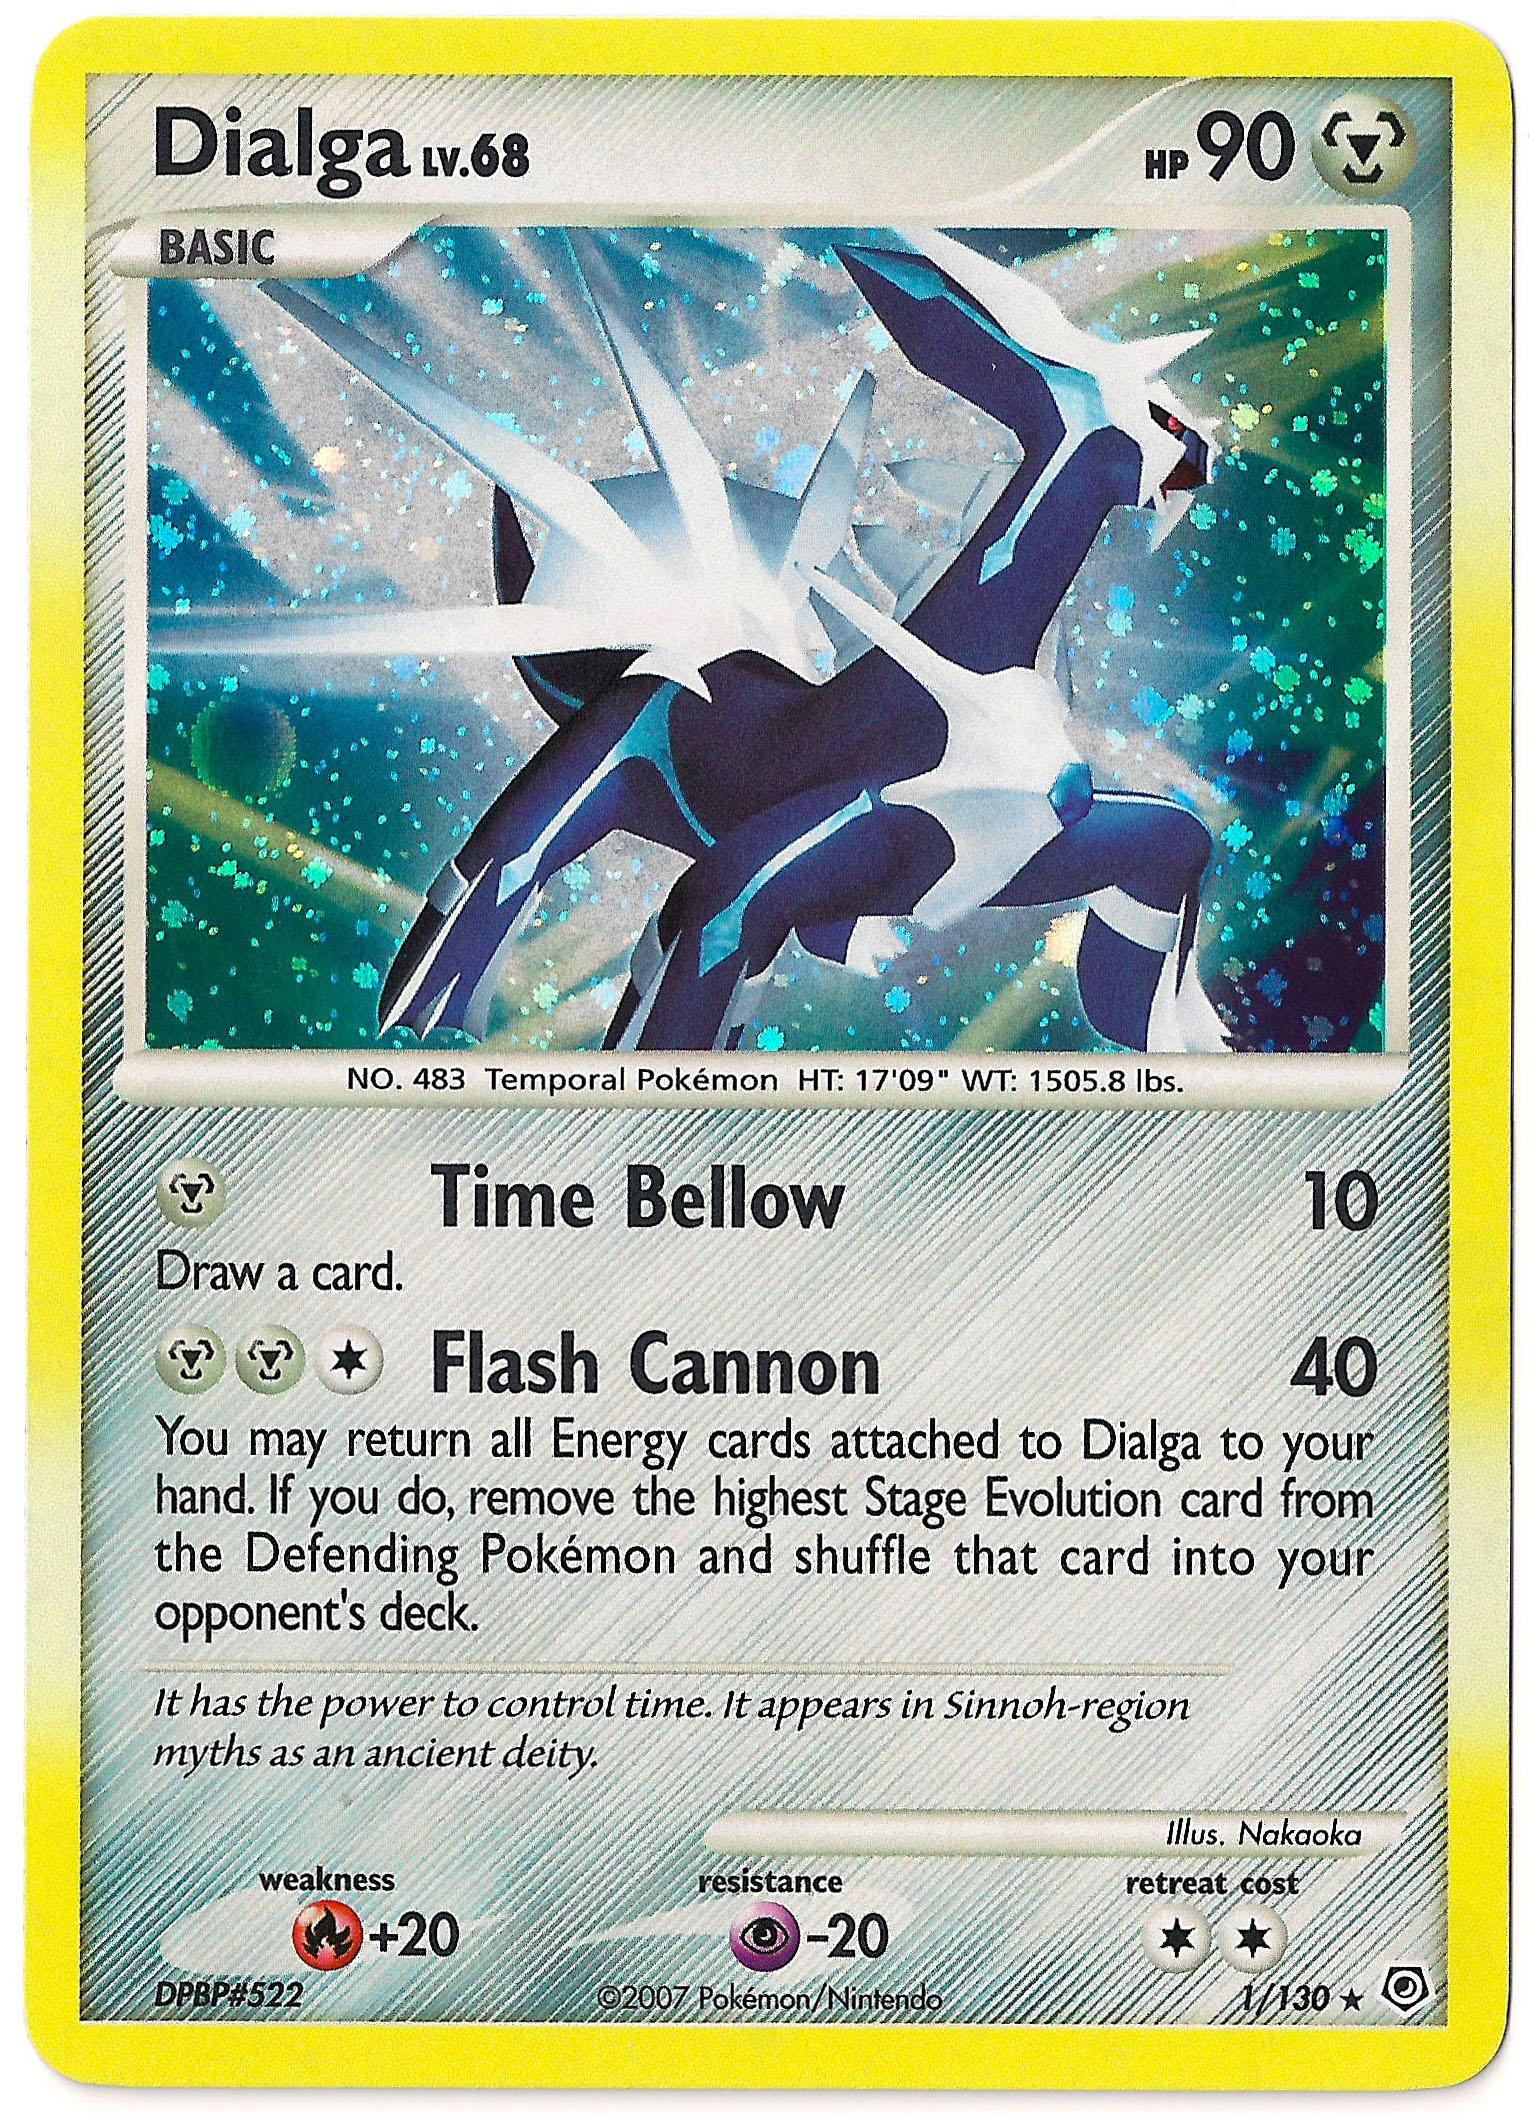 Dialga Pokemon Card Images | Pokemon Images